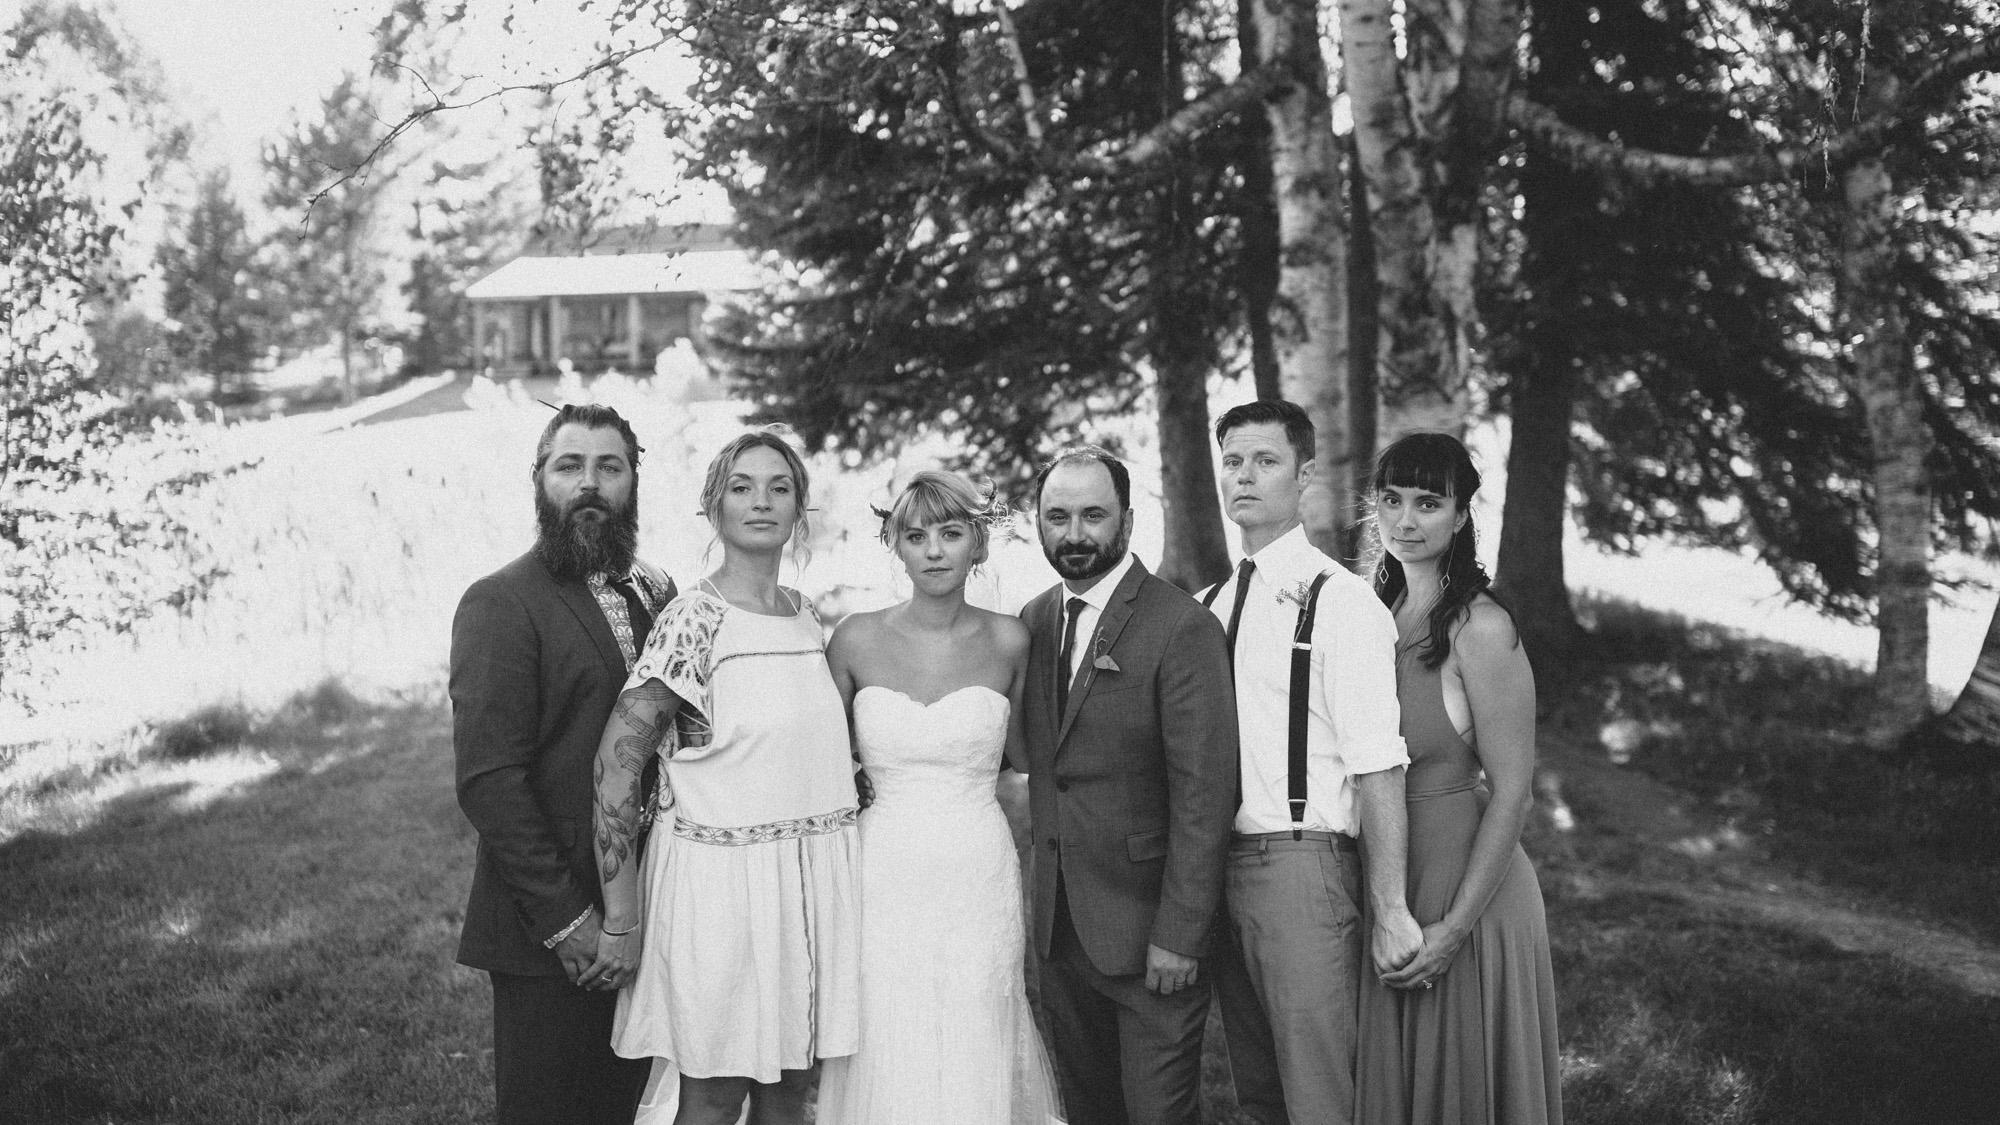 Montana_Wedding_Photos_alec_vanderboom-0108.jpg